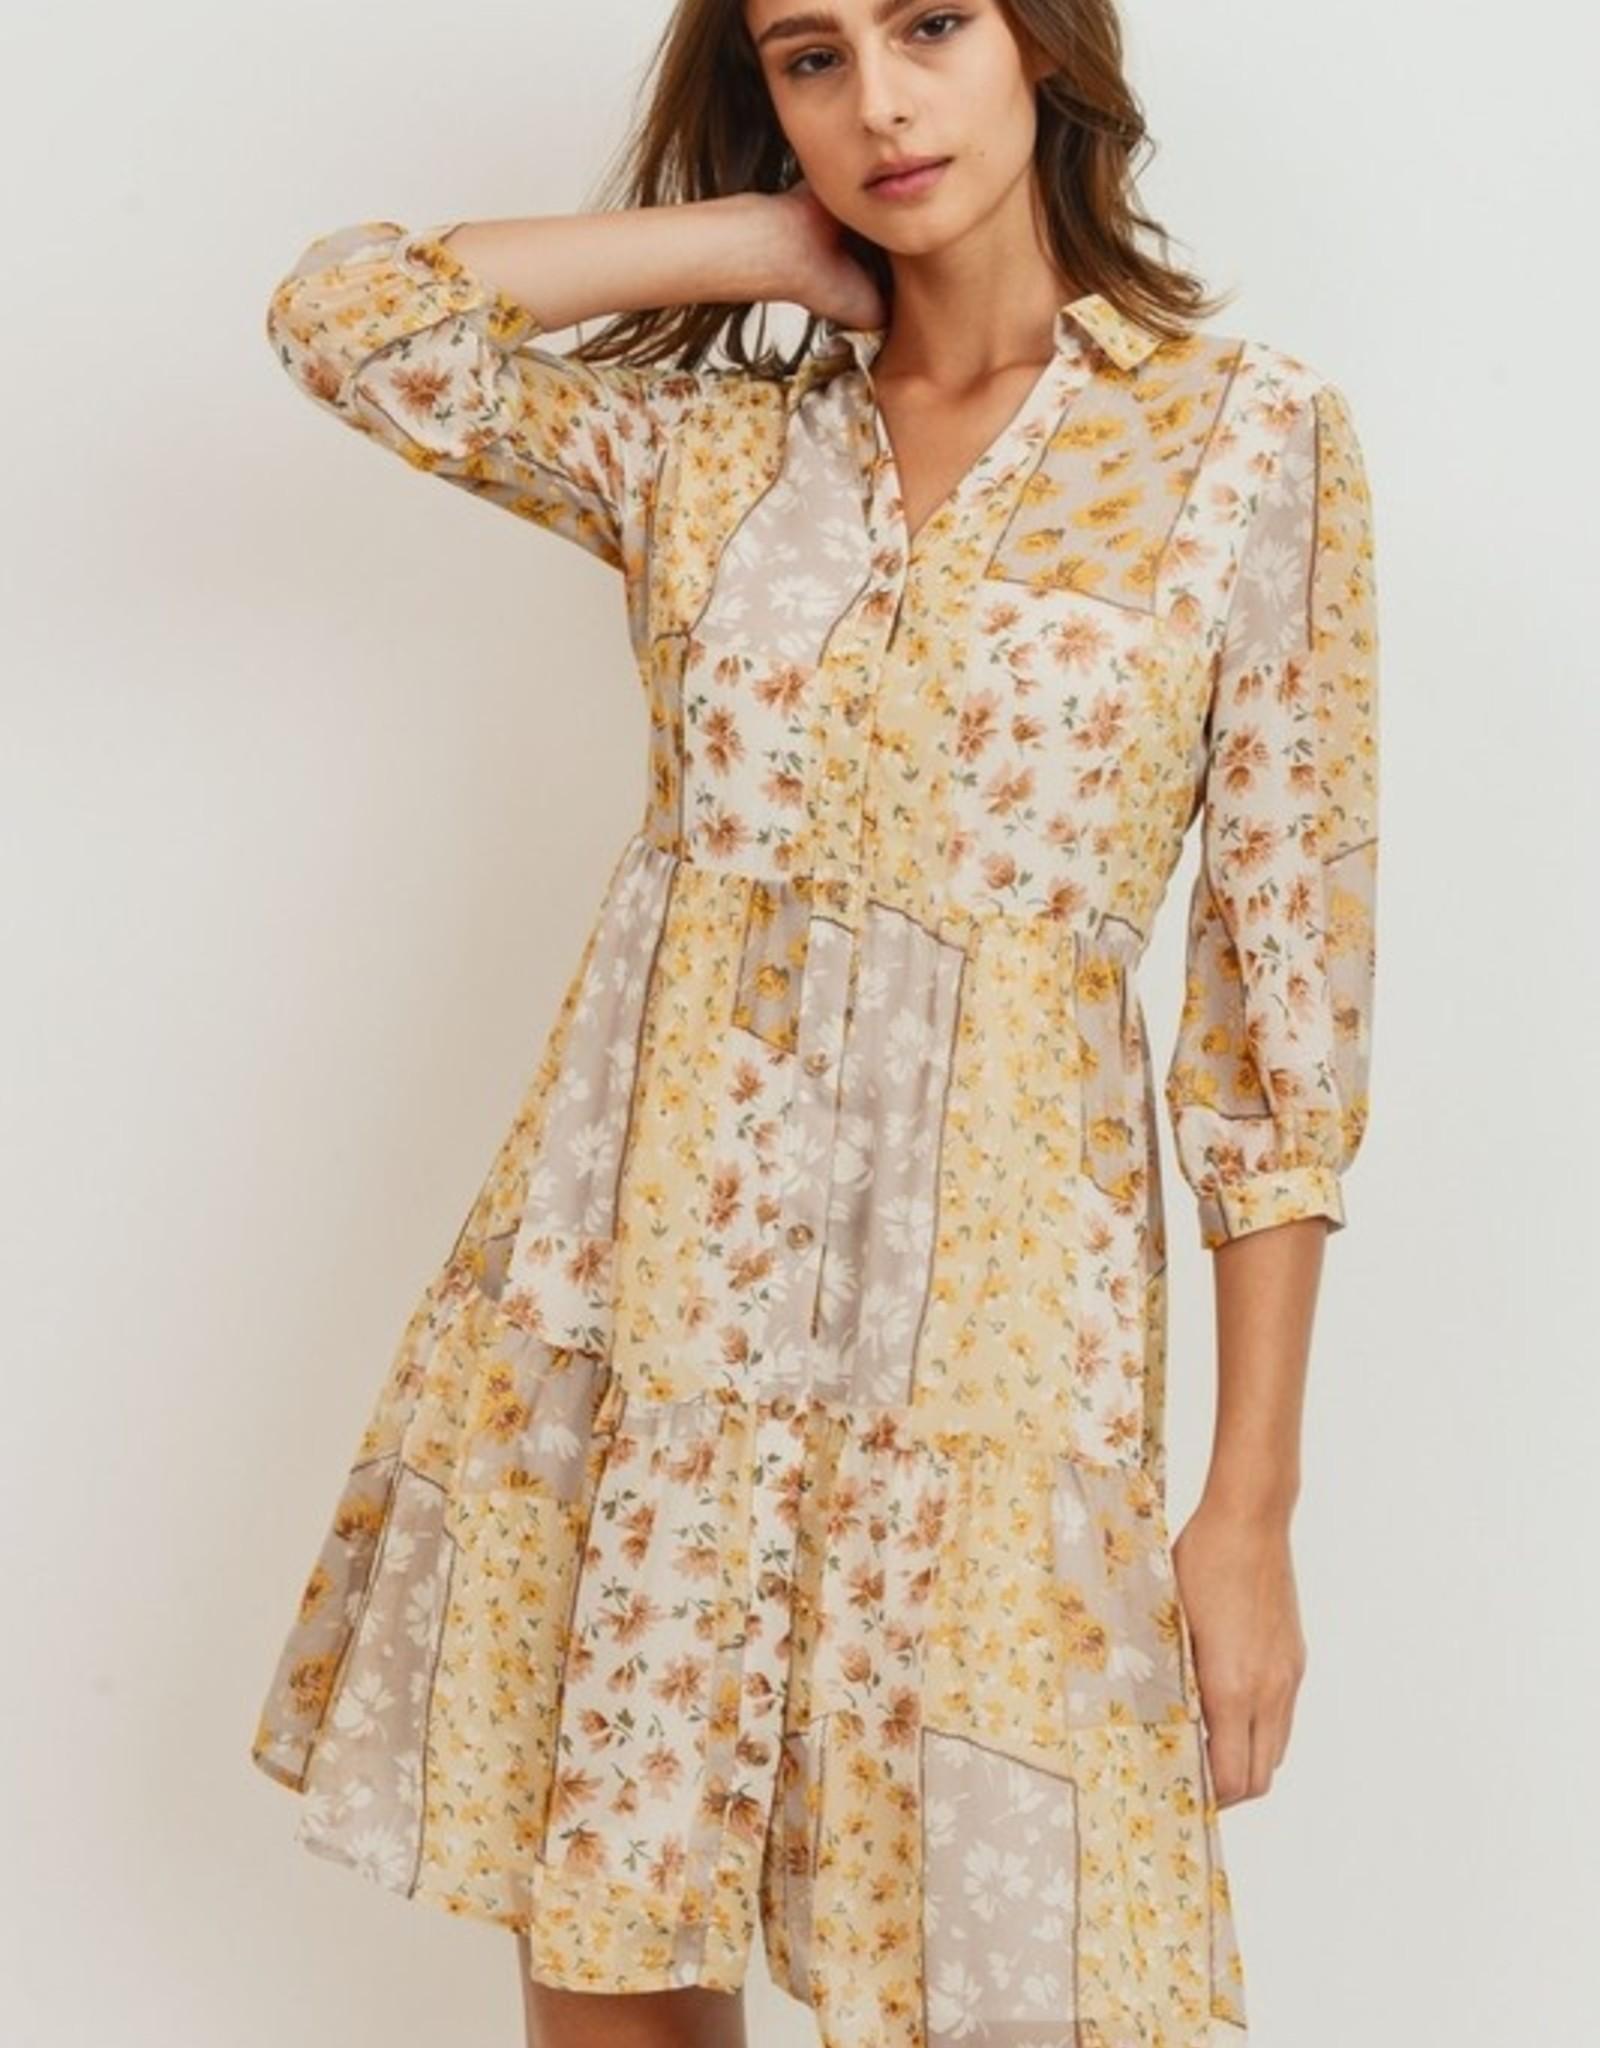 Papercrane Floral Patch Print Can Can Dress